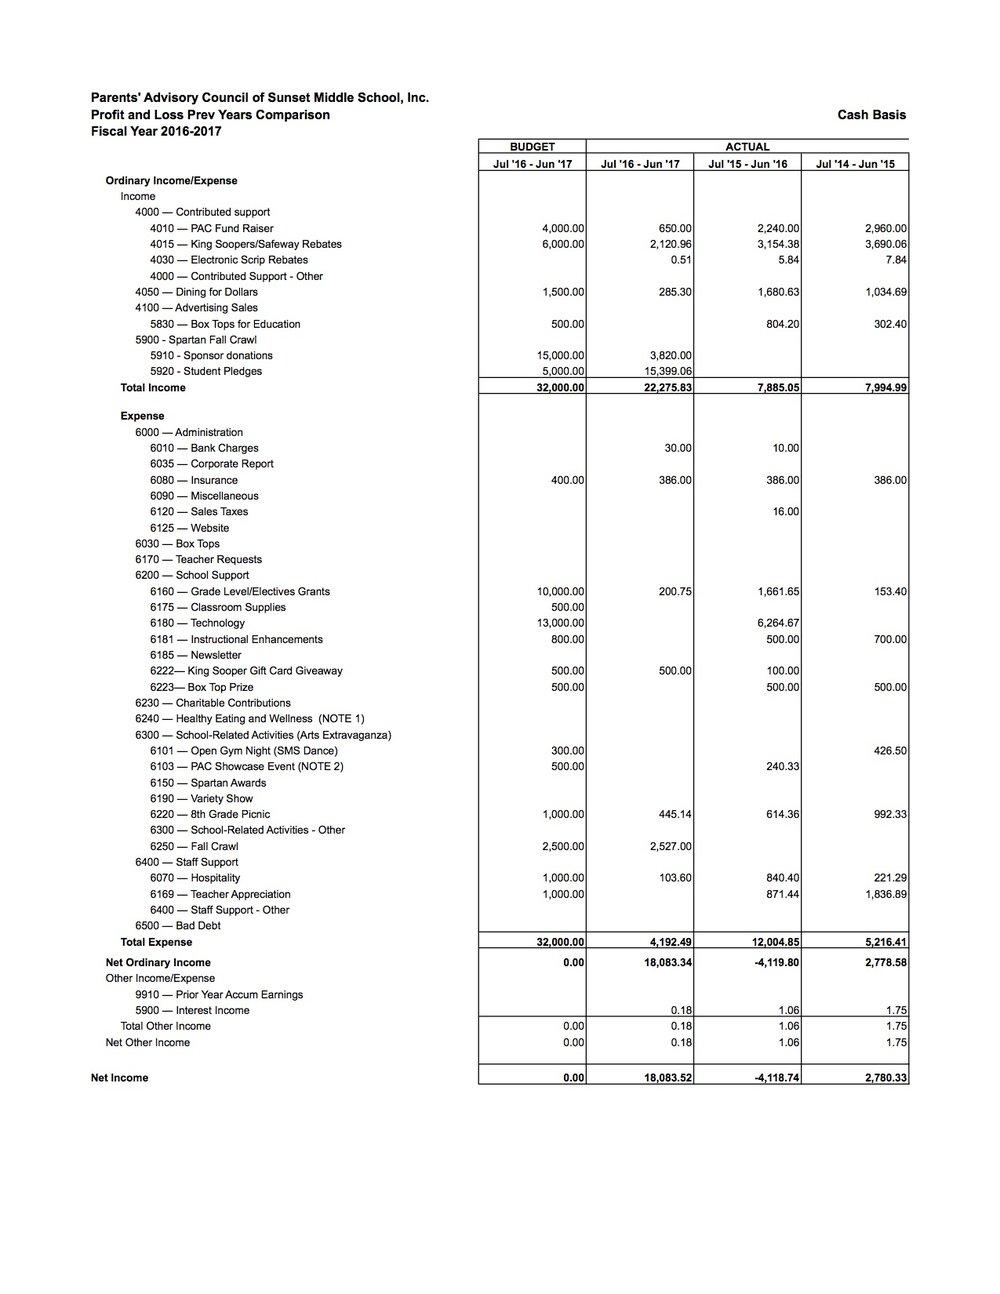 PAC Comparitive Profit & Loss Statement copy.jpg